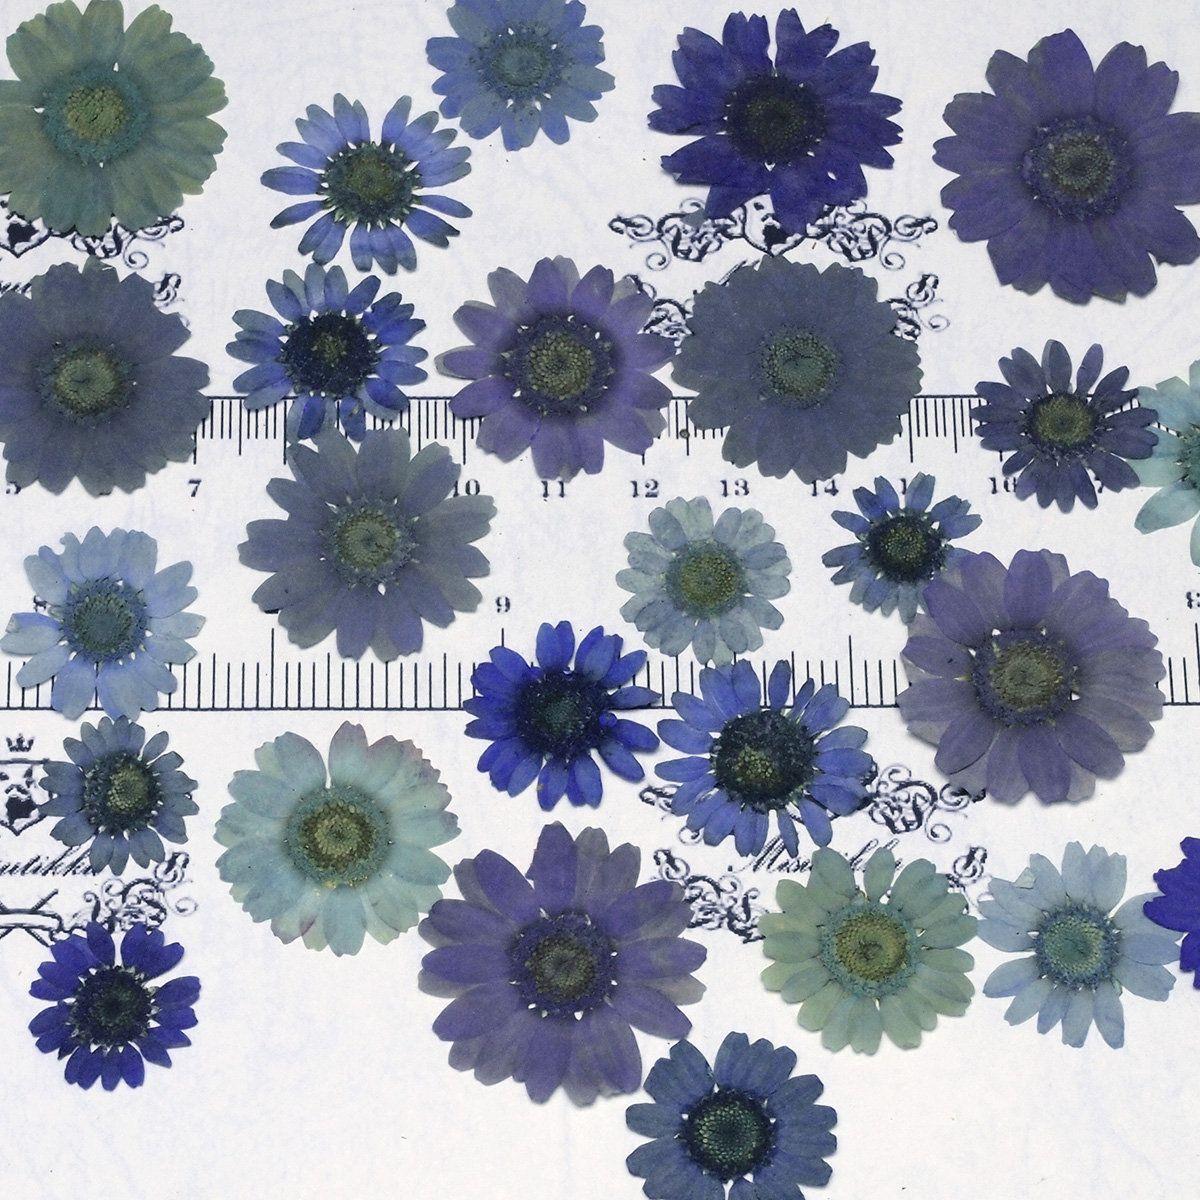 12pcs Natural Pressed Flower For Card Making /& Floral Craft DIY Phone Case